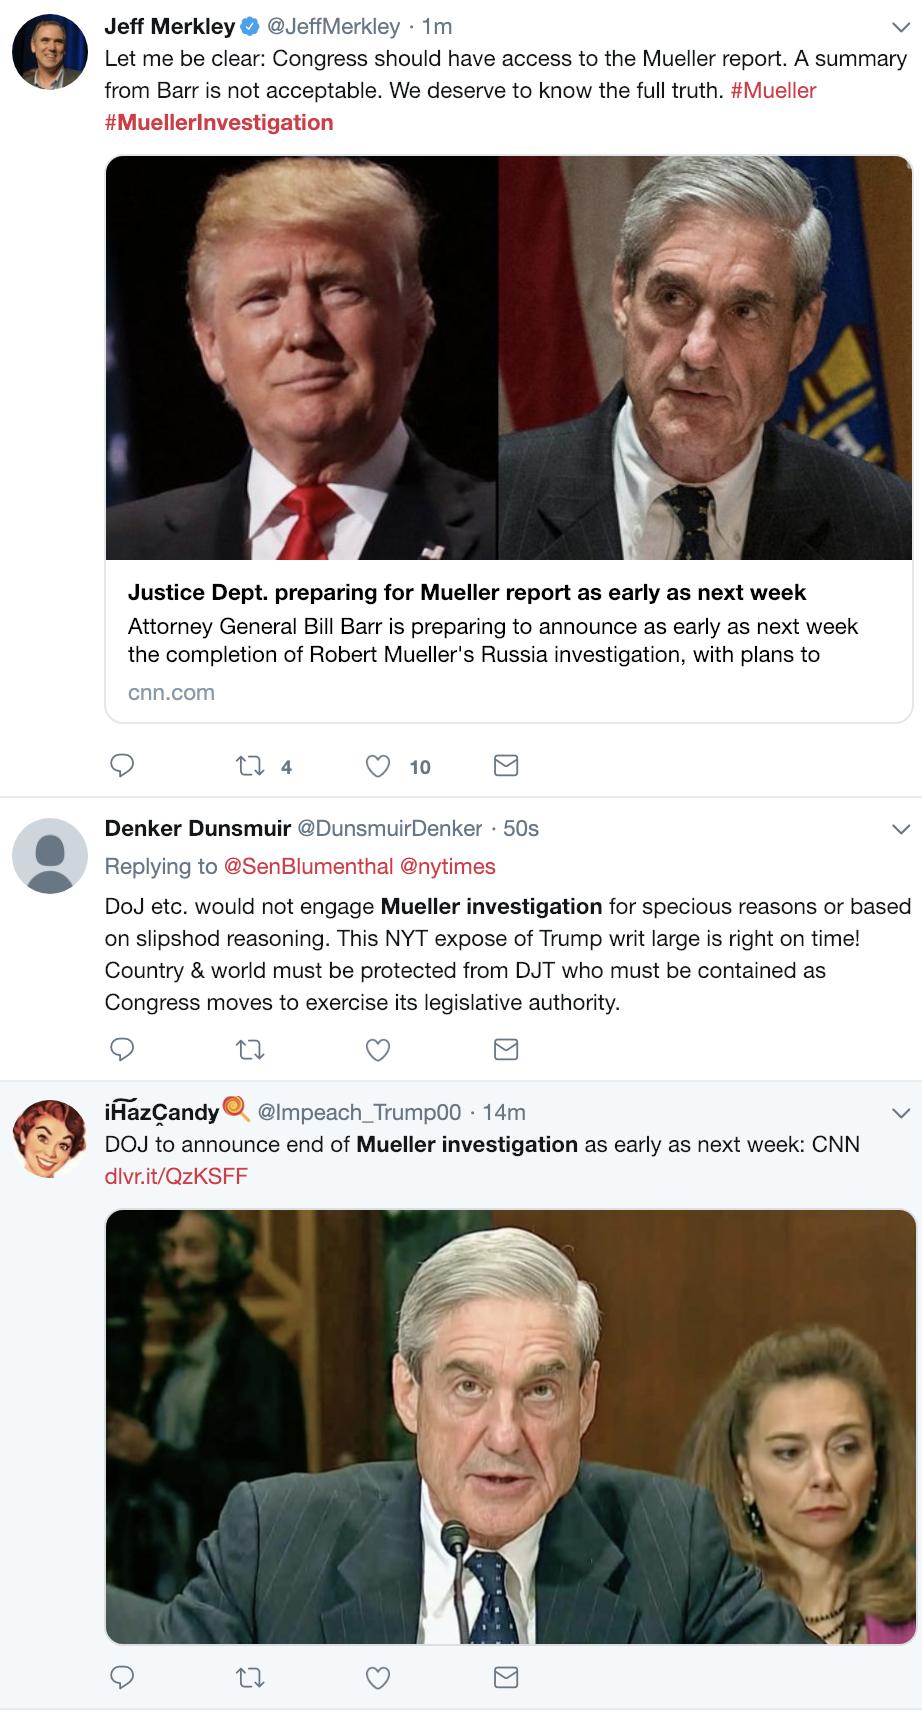 Screen-Shot-2019-02-20-at-2.00.32-PM CNN Drops Wednesday Afternoon Mueller Probe Bomb Corruption Crime Donald Trump Mueller Politics Robert Mueller Russia Top Stories